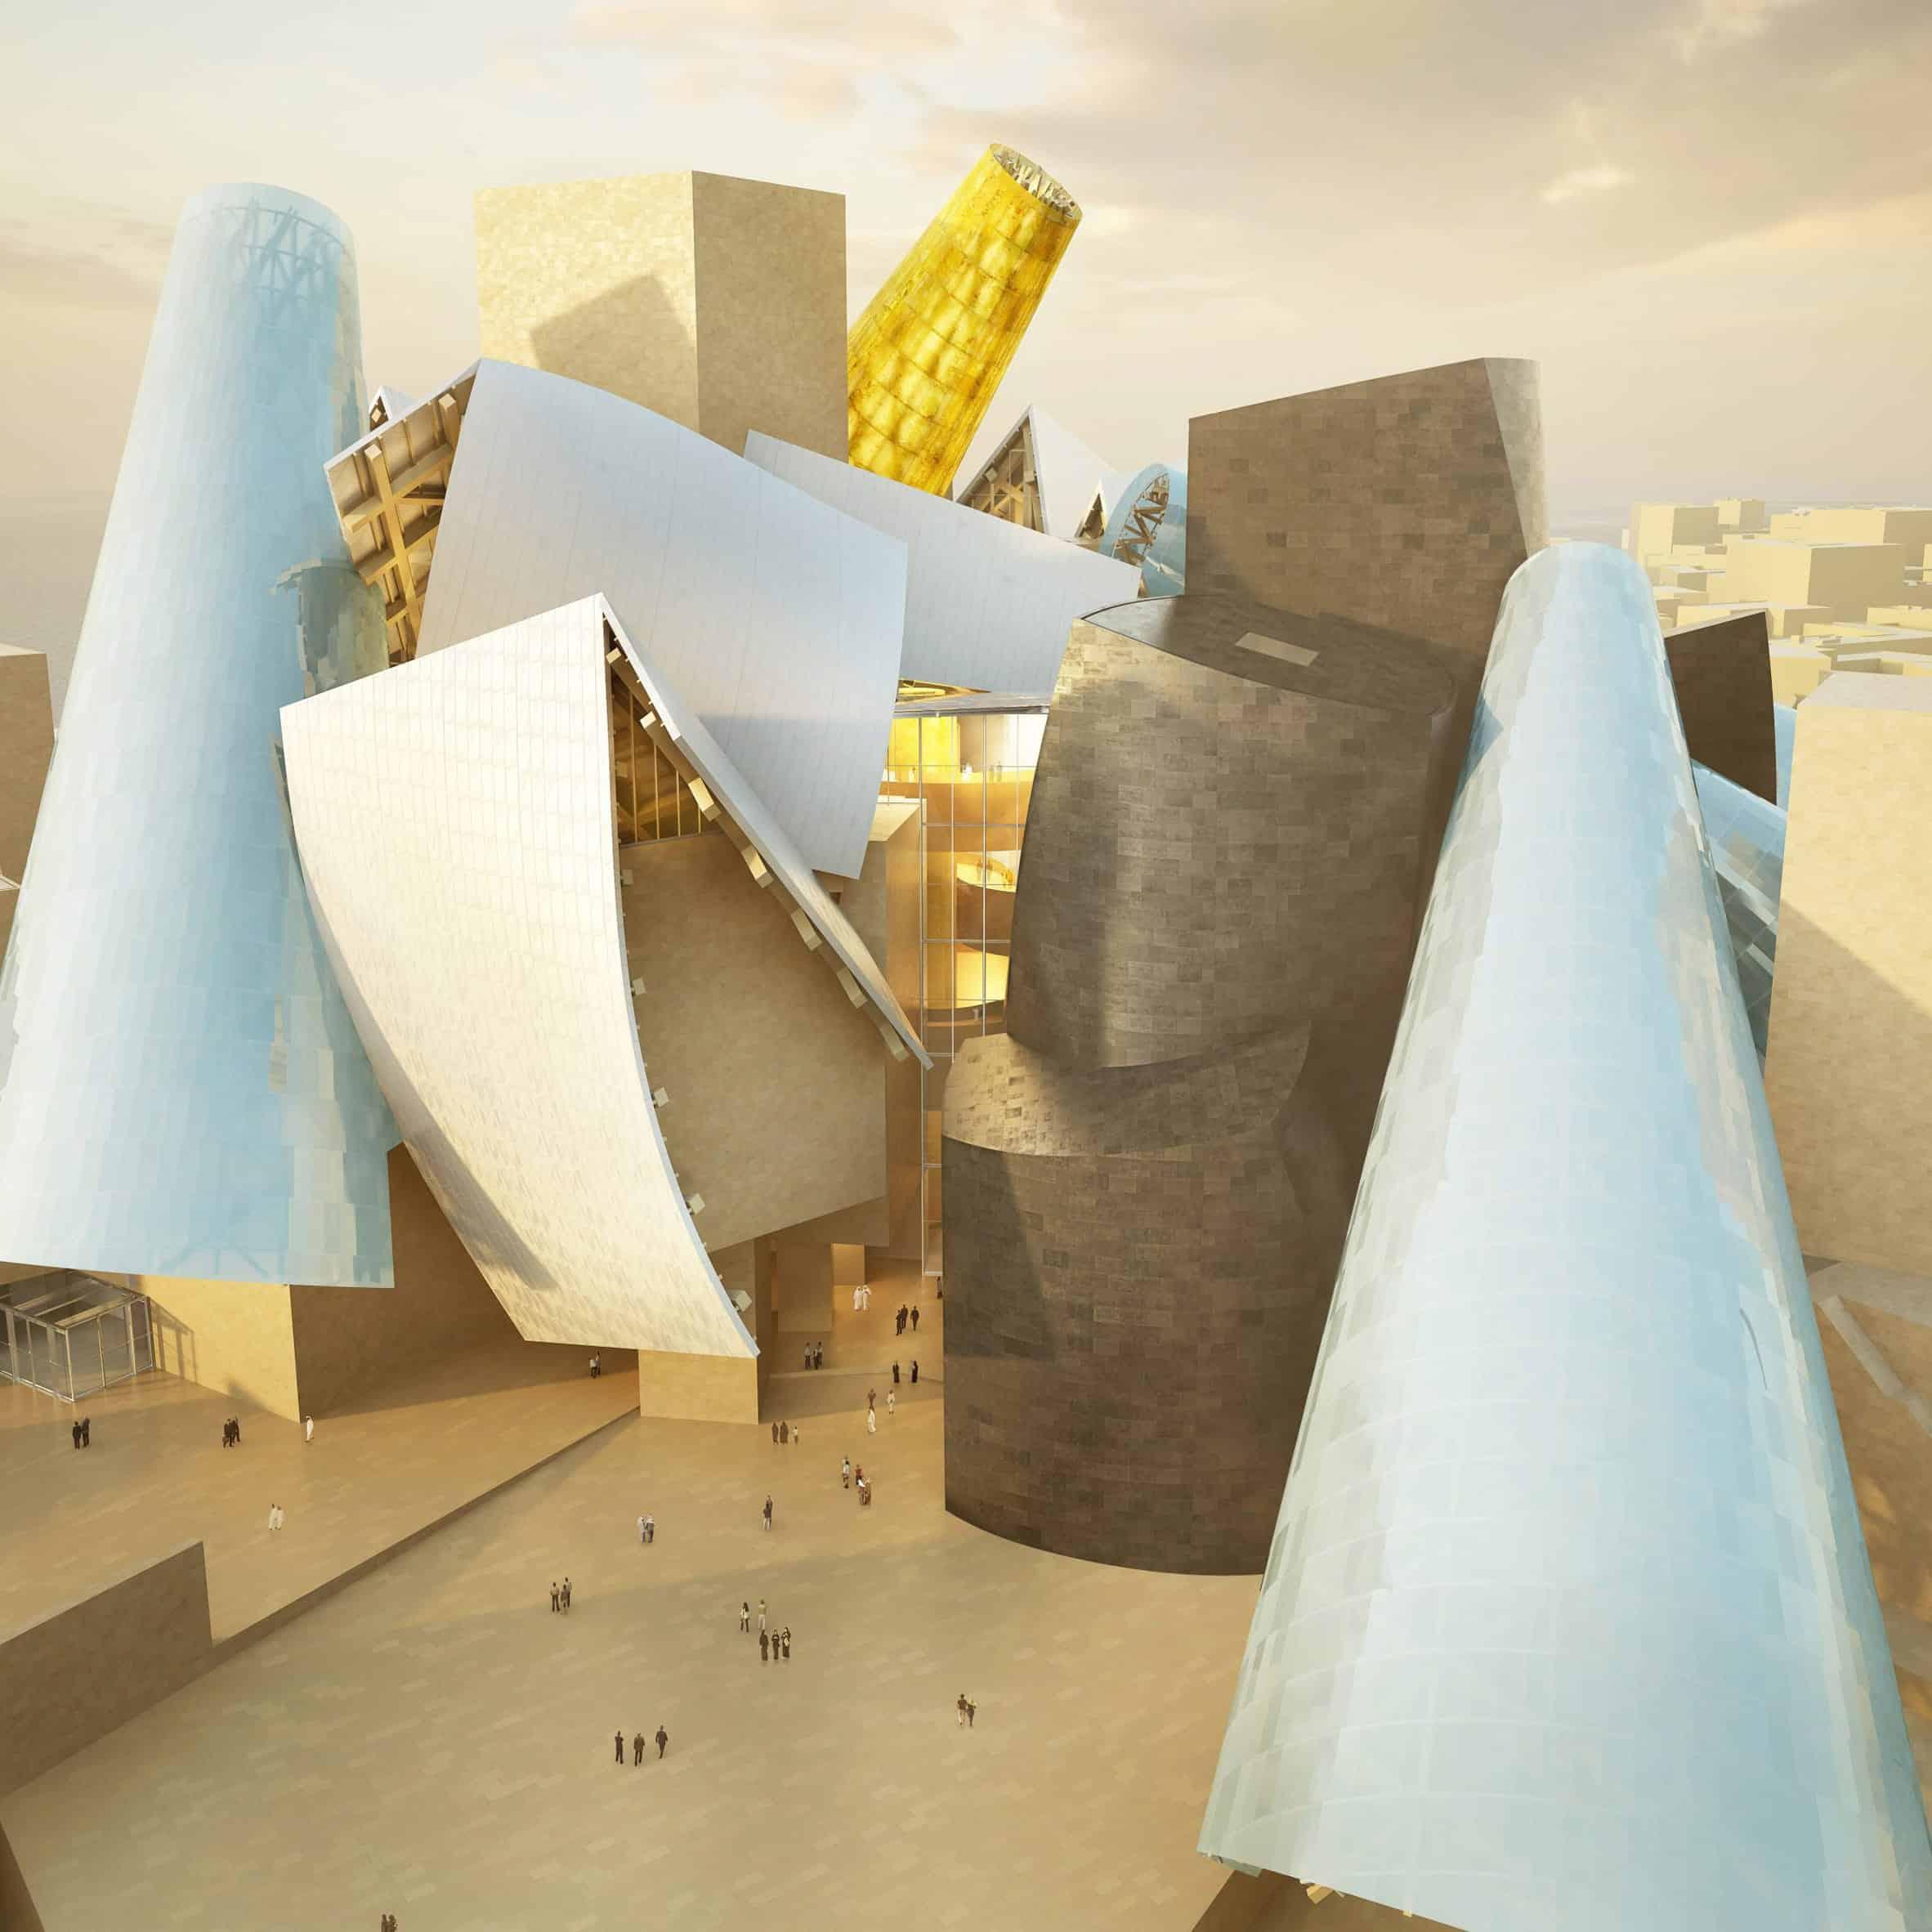 Guggenheim Museum (Abu Dhabi)